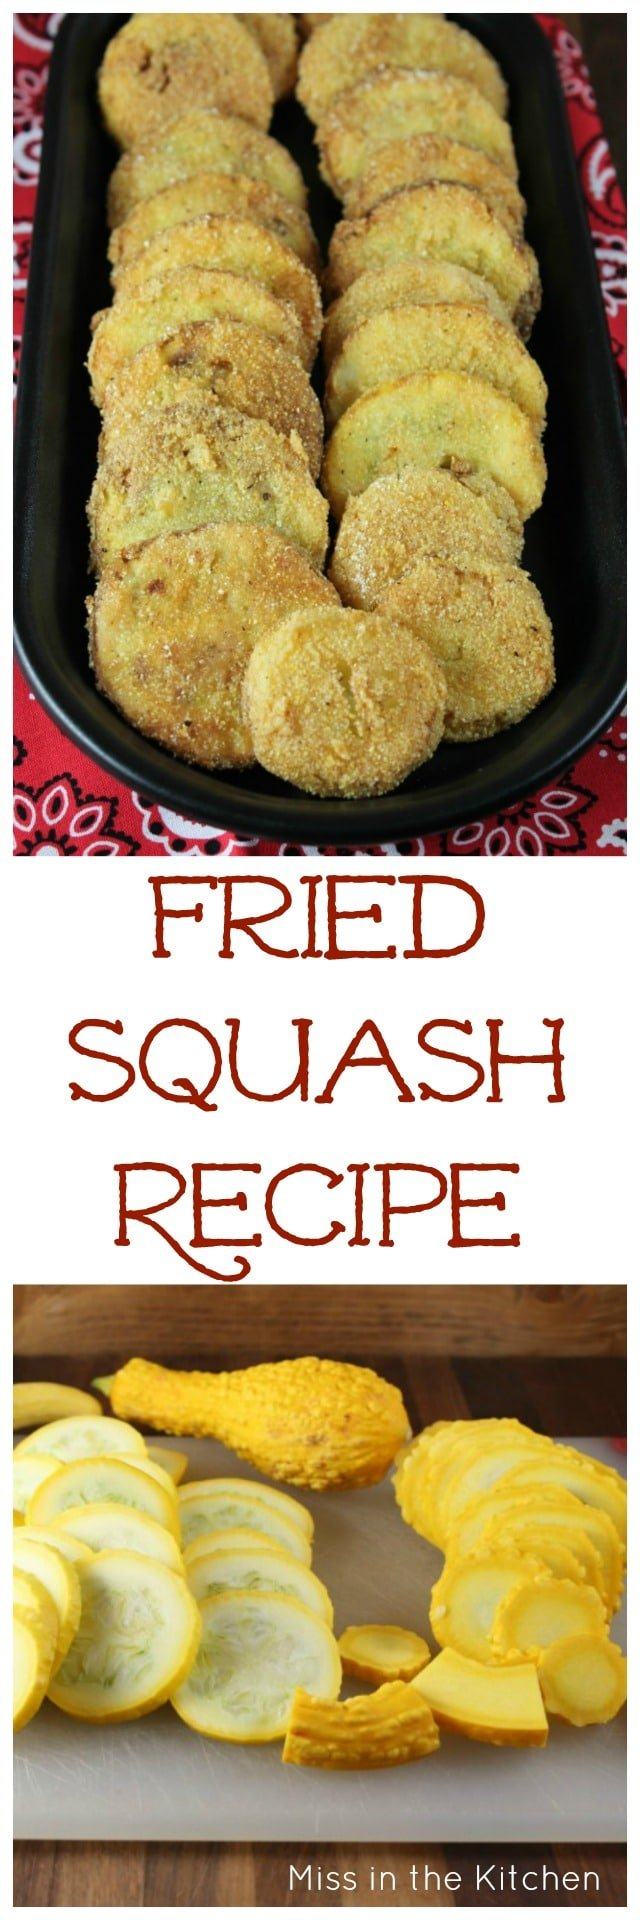 Fried Squash Recipe found at MissintheKitchen.com